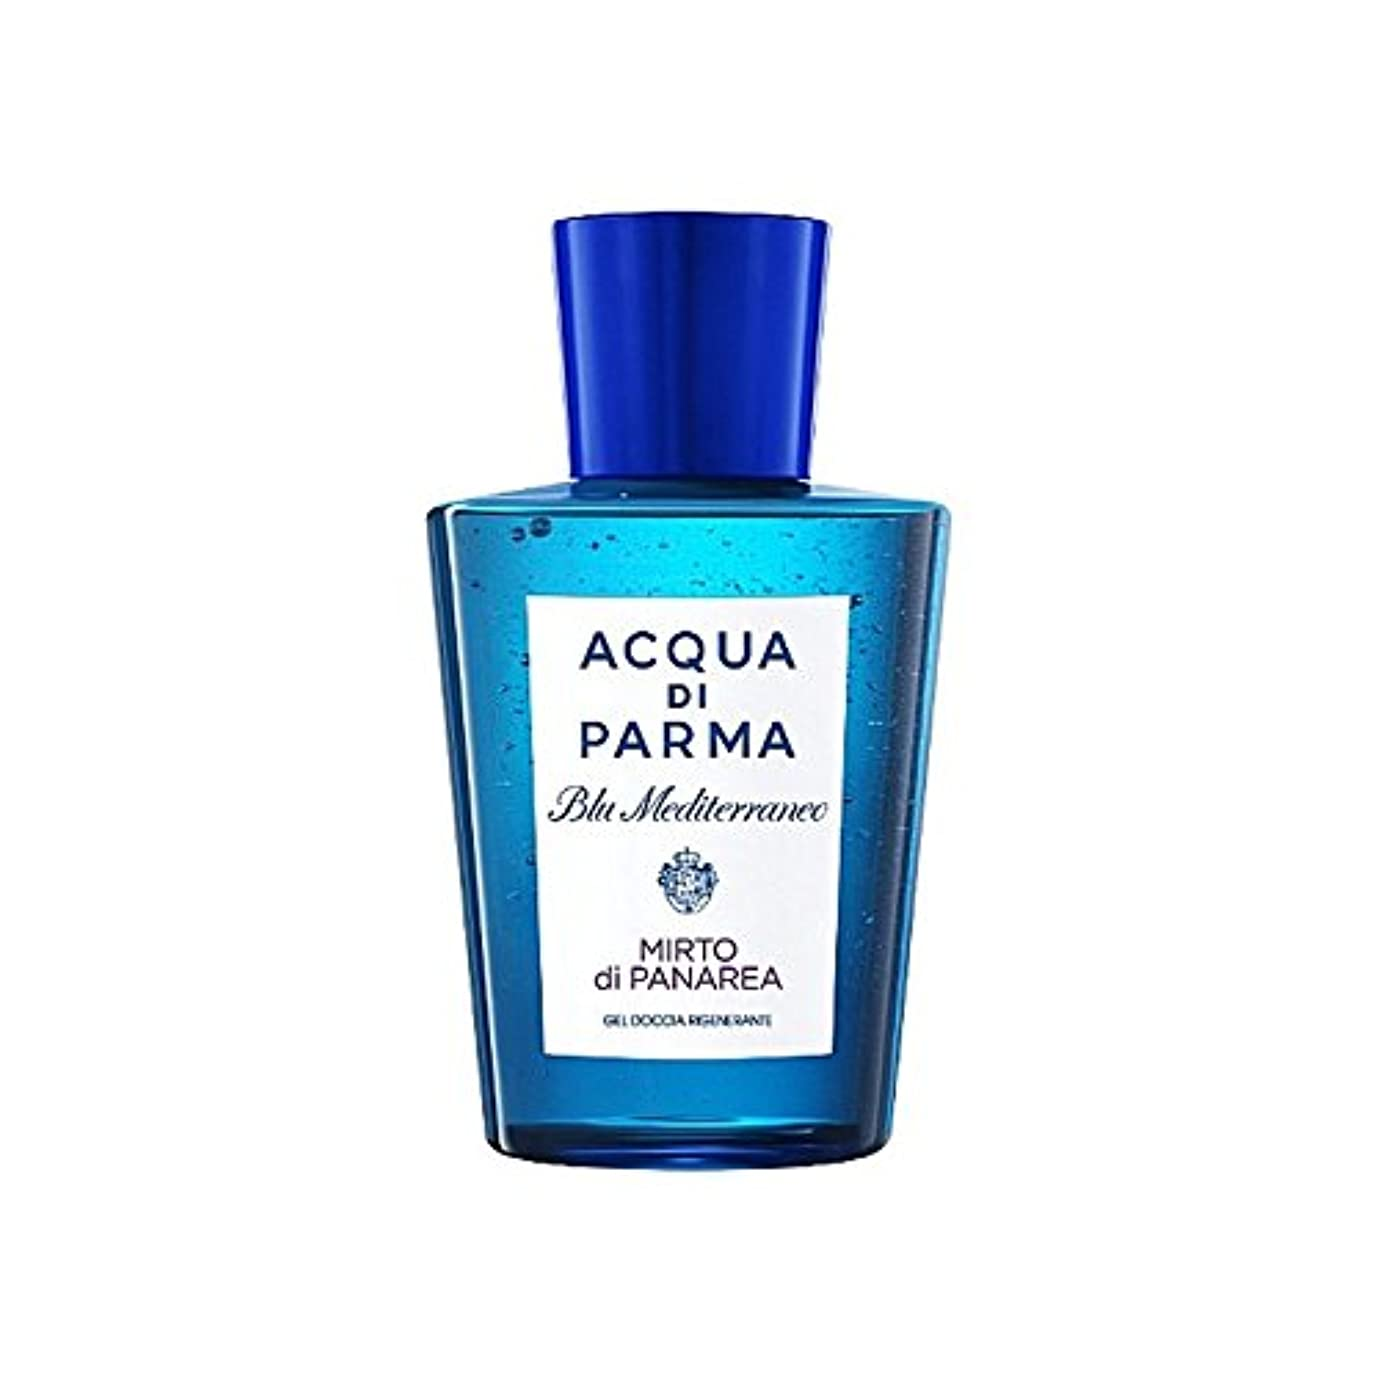 Acqua Di Parma Blu Mediterraneo Mirto Di Panarea Shower Gel 200ml - アクアディパルマブルーメディミルトディパナレアシャワージェル200 [並行輸入品]